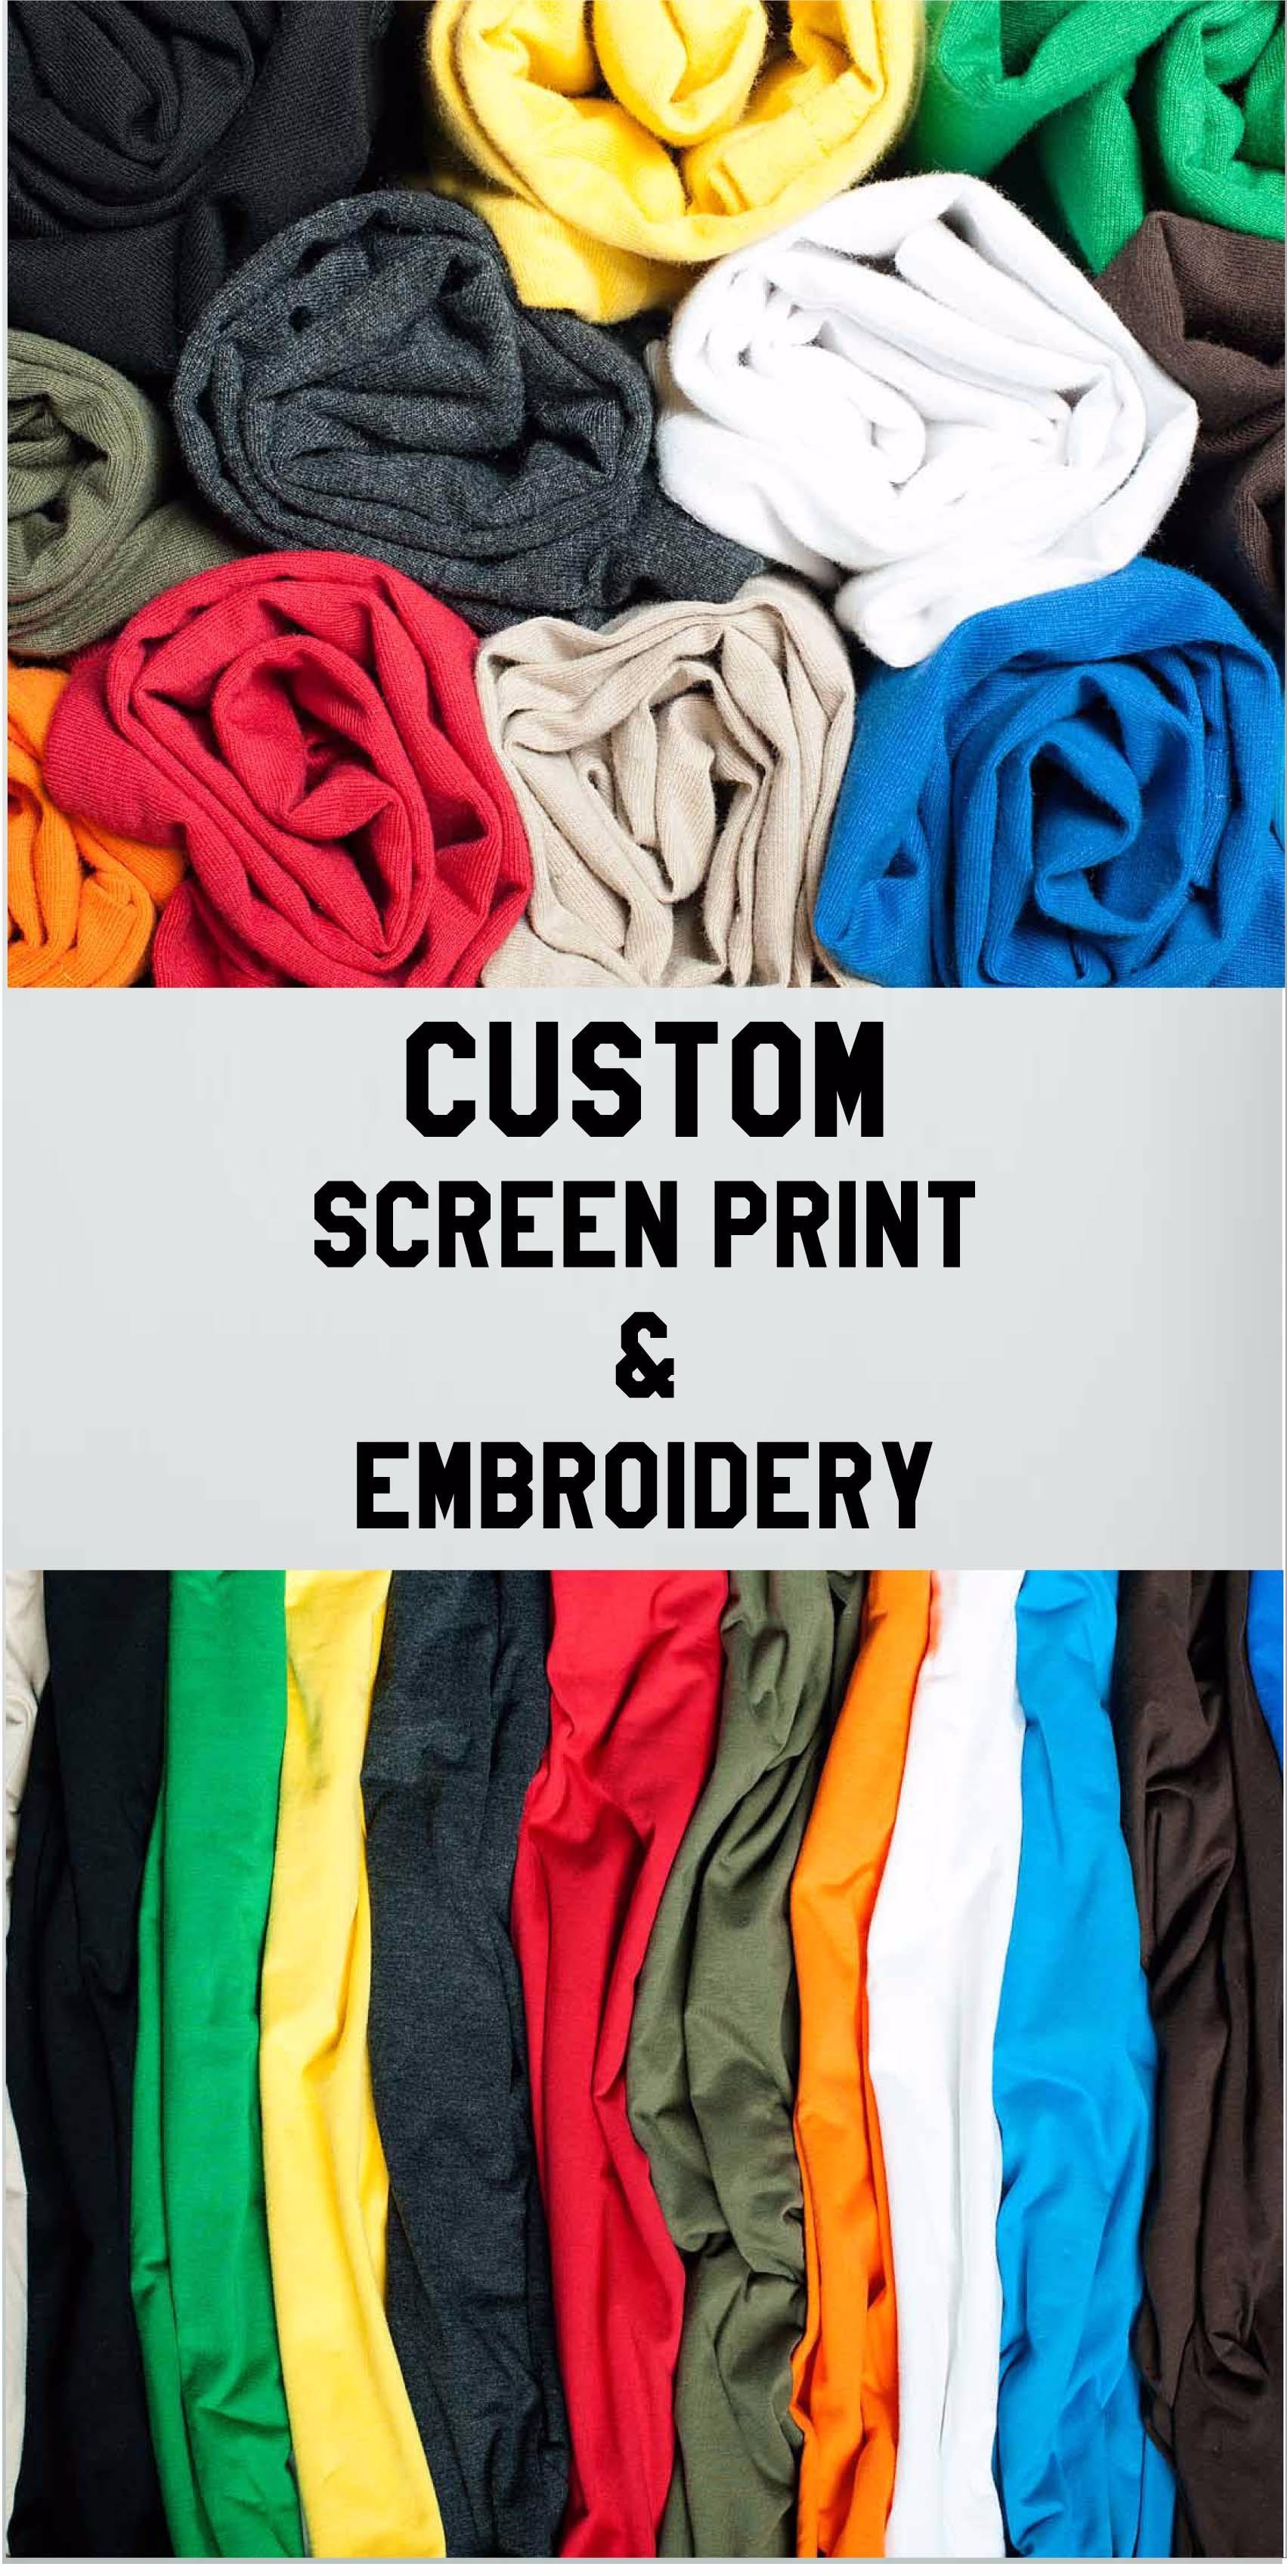 wholesale t shirts N image 13